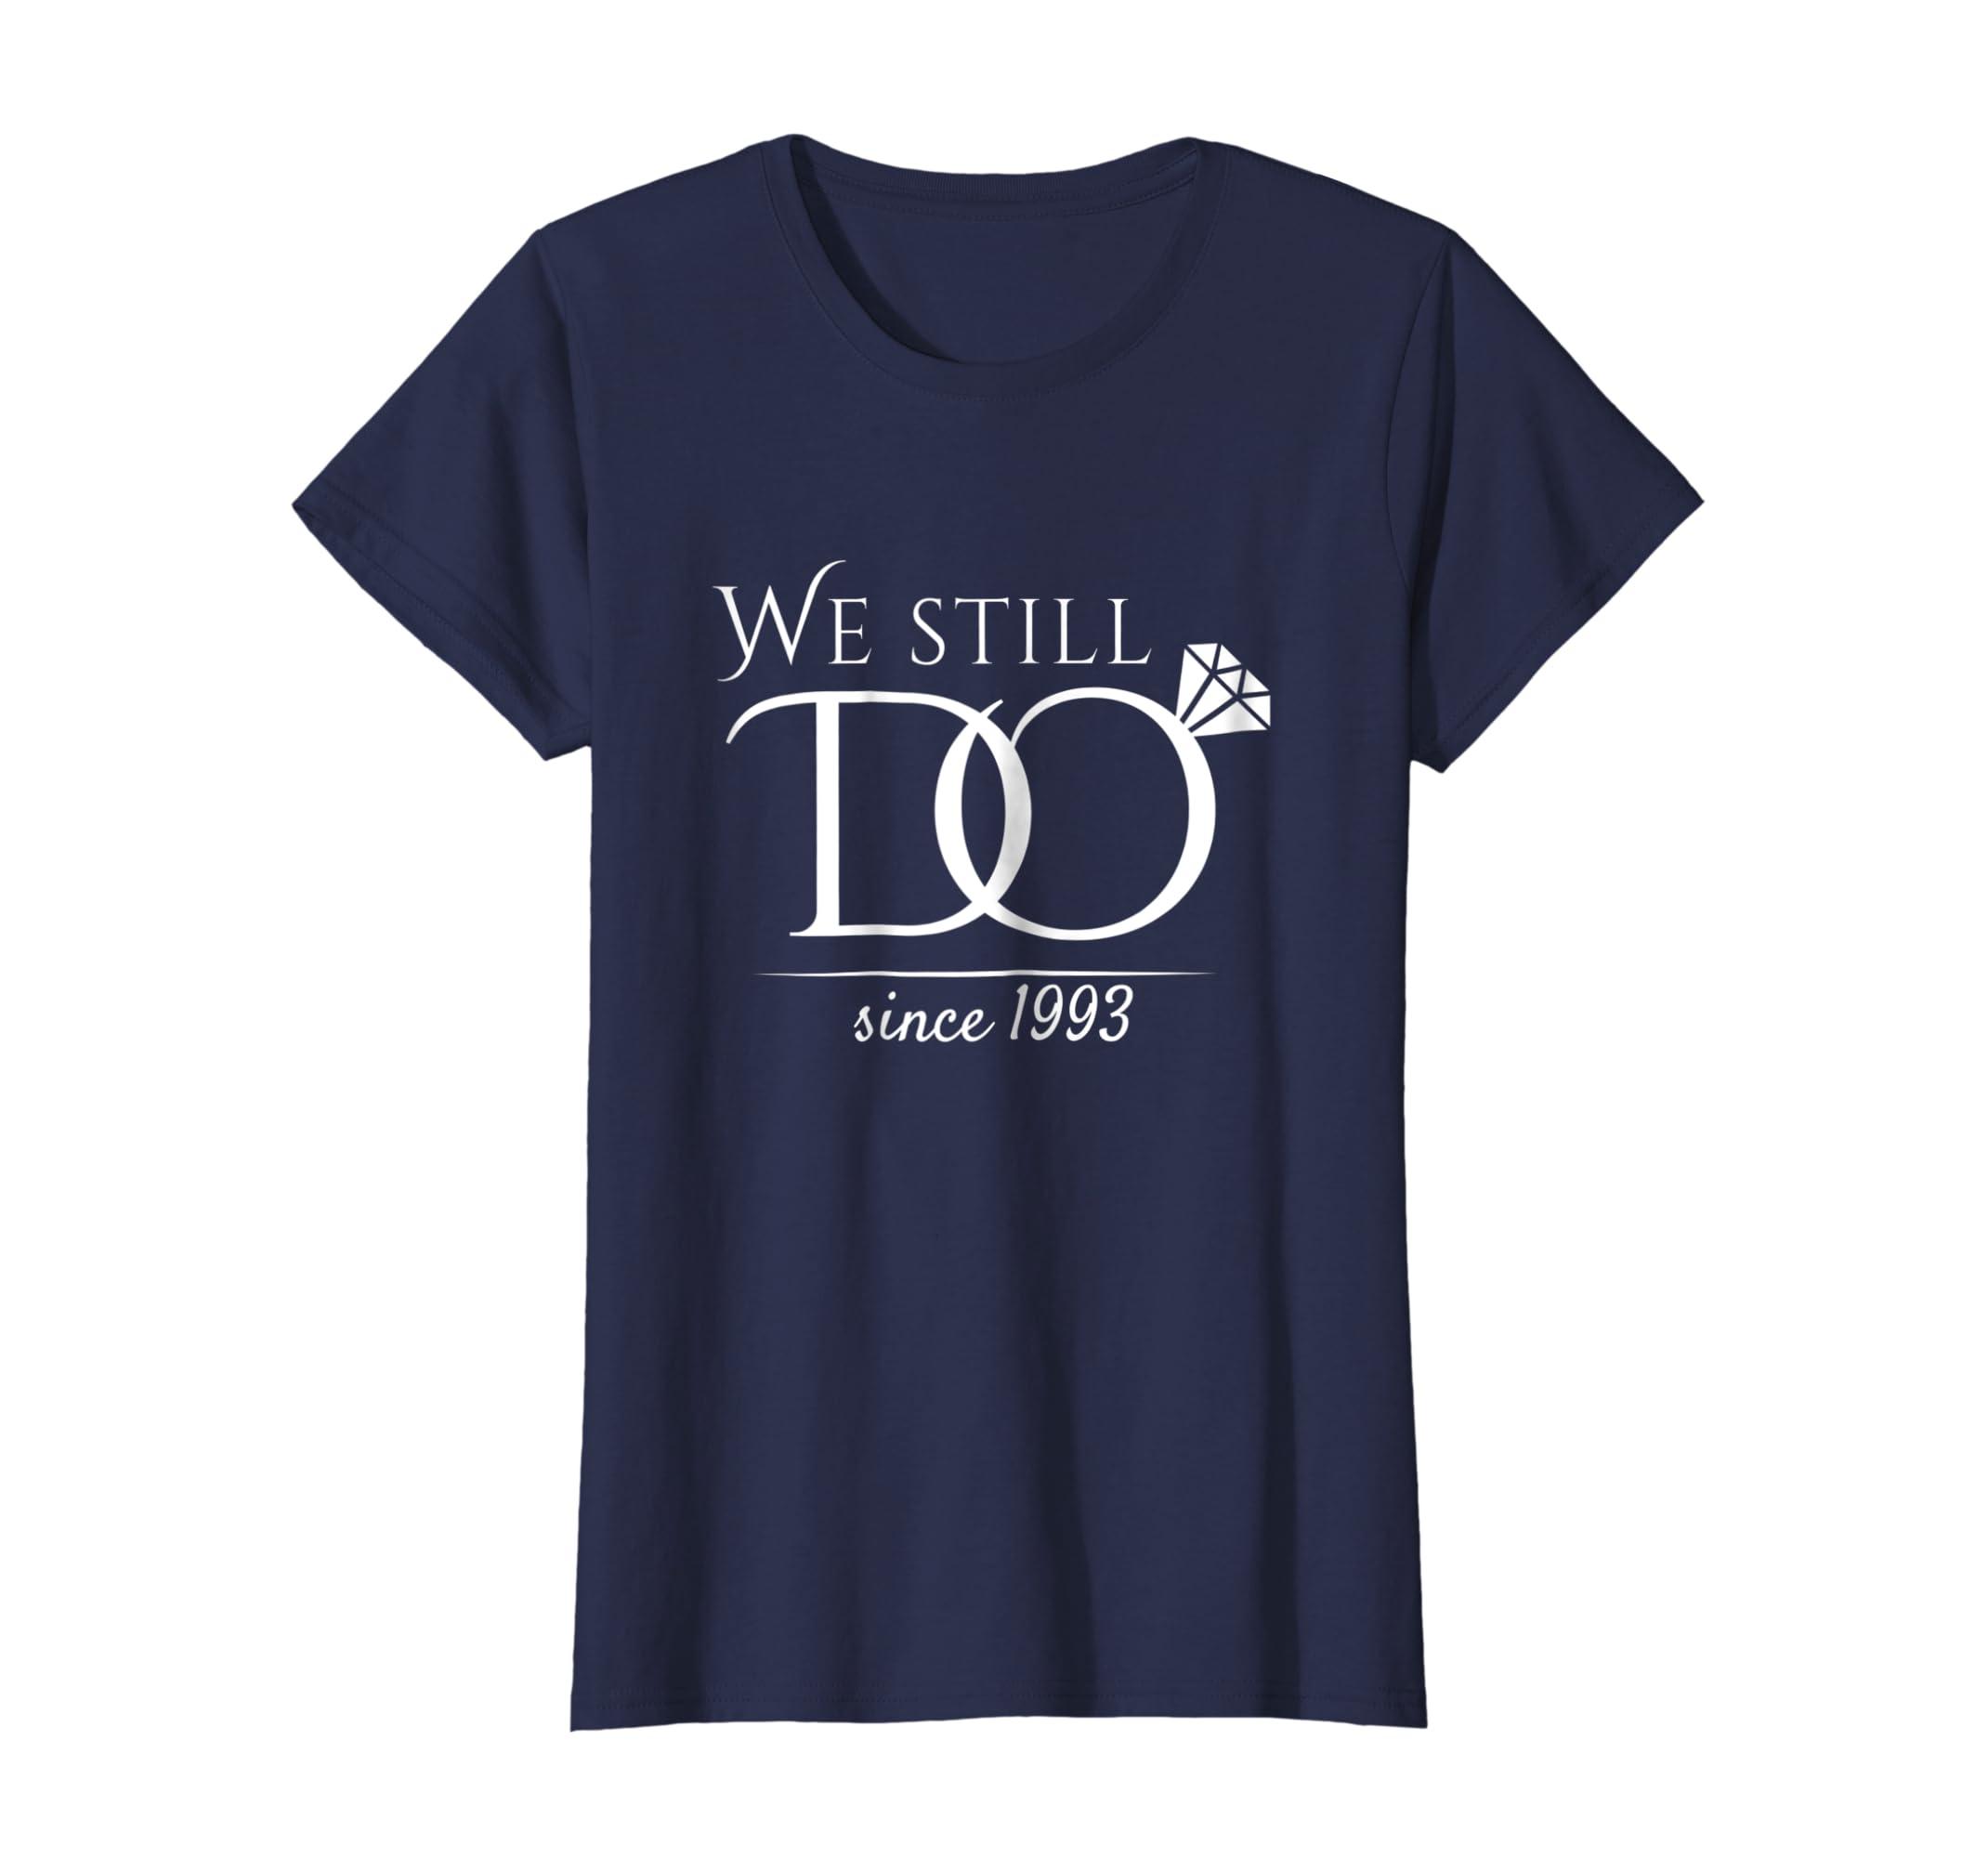 b08b1c8b3 Amazon.com: 25th Wedding Anniversary T-Shirt Funny For Married In 1993 W:  Clothing